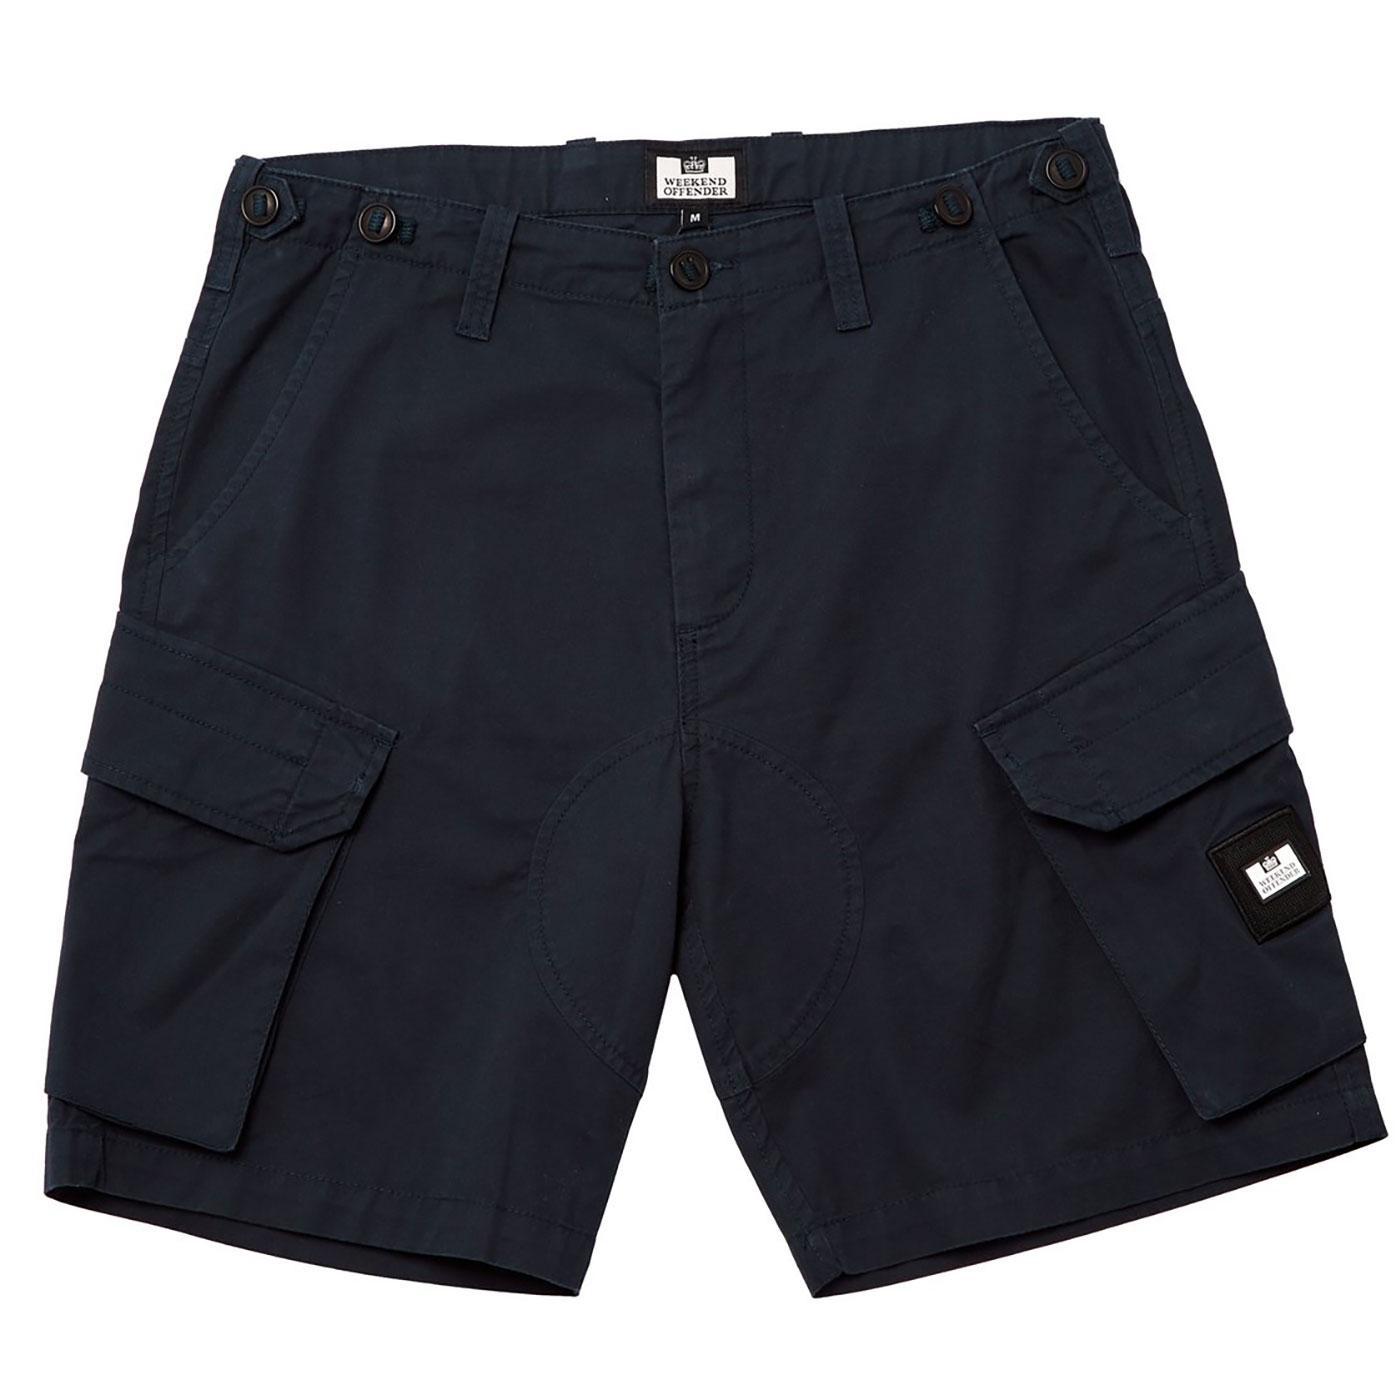 New Jersey WEEKEND OFFENDER Men's Cargo Shorts N